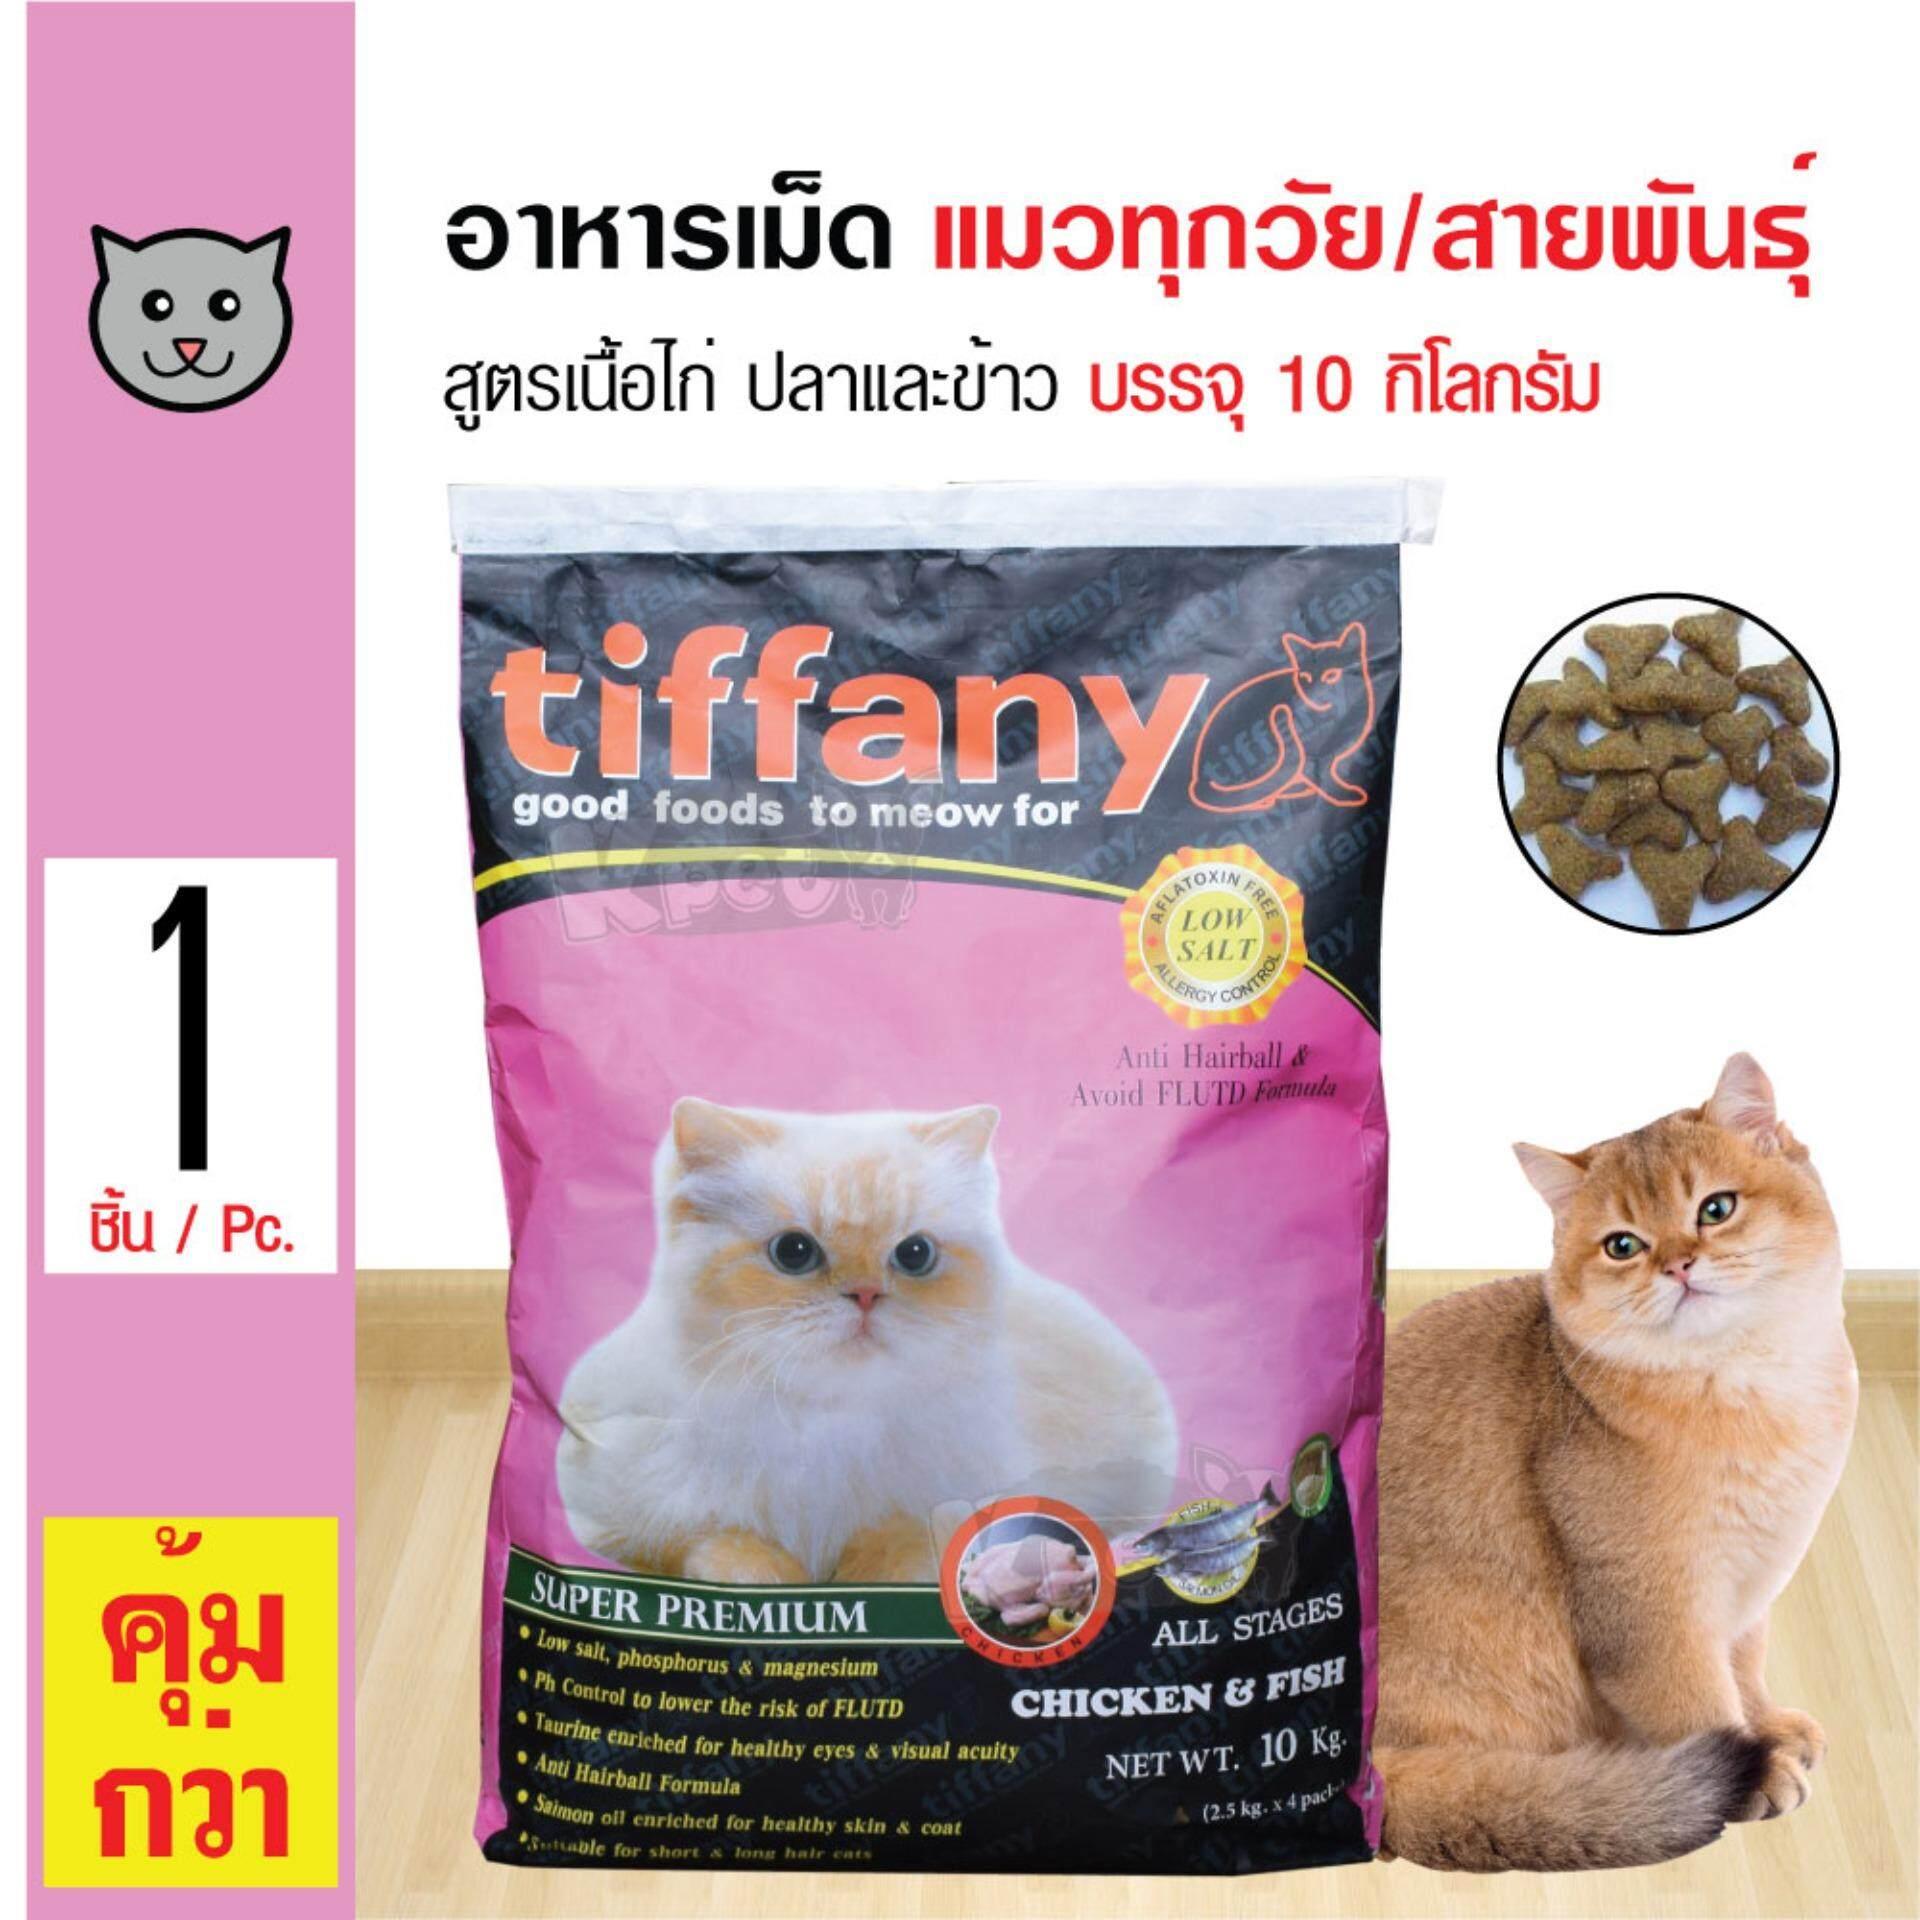 Tiffany Cat 10 Kg. อาหารแมว สูตรเนื้อไก่ ปลา และข้าว บำรุงขนและผิวหนัง สำหรับแมวทุกช่วงวัย (10 กิโลกรัม/กระสอบ) By Kpet.